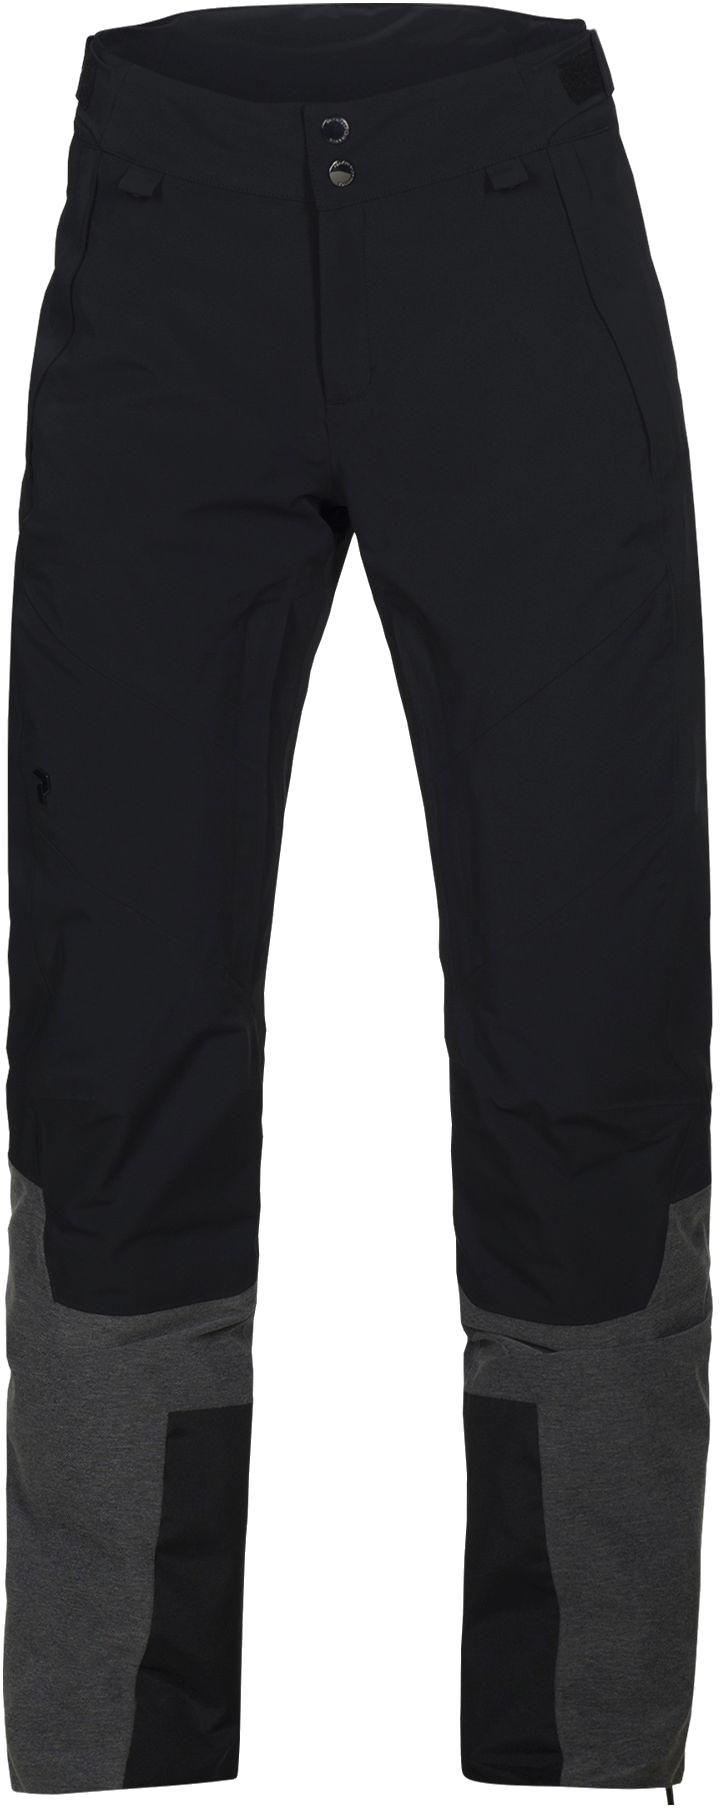 Peak Performance W Velaero 2L Pants - Black S